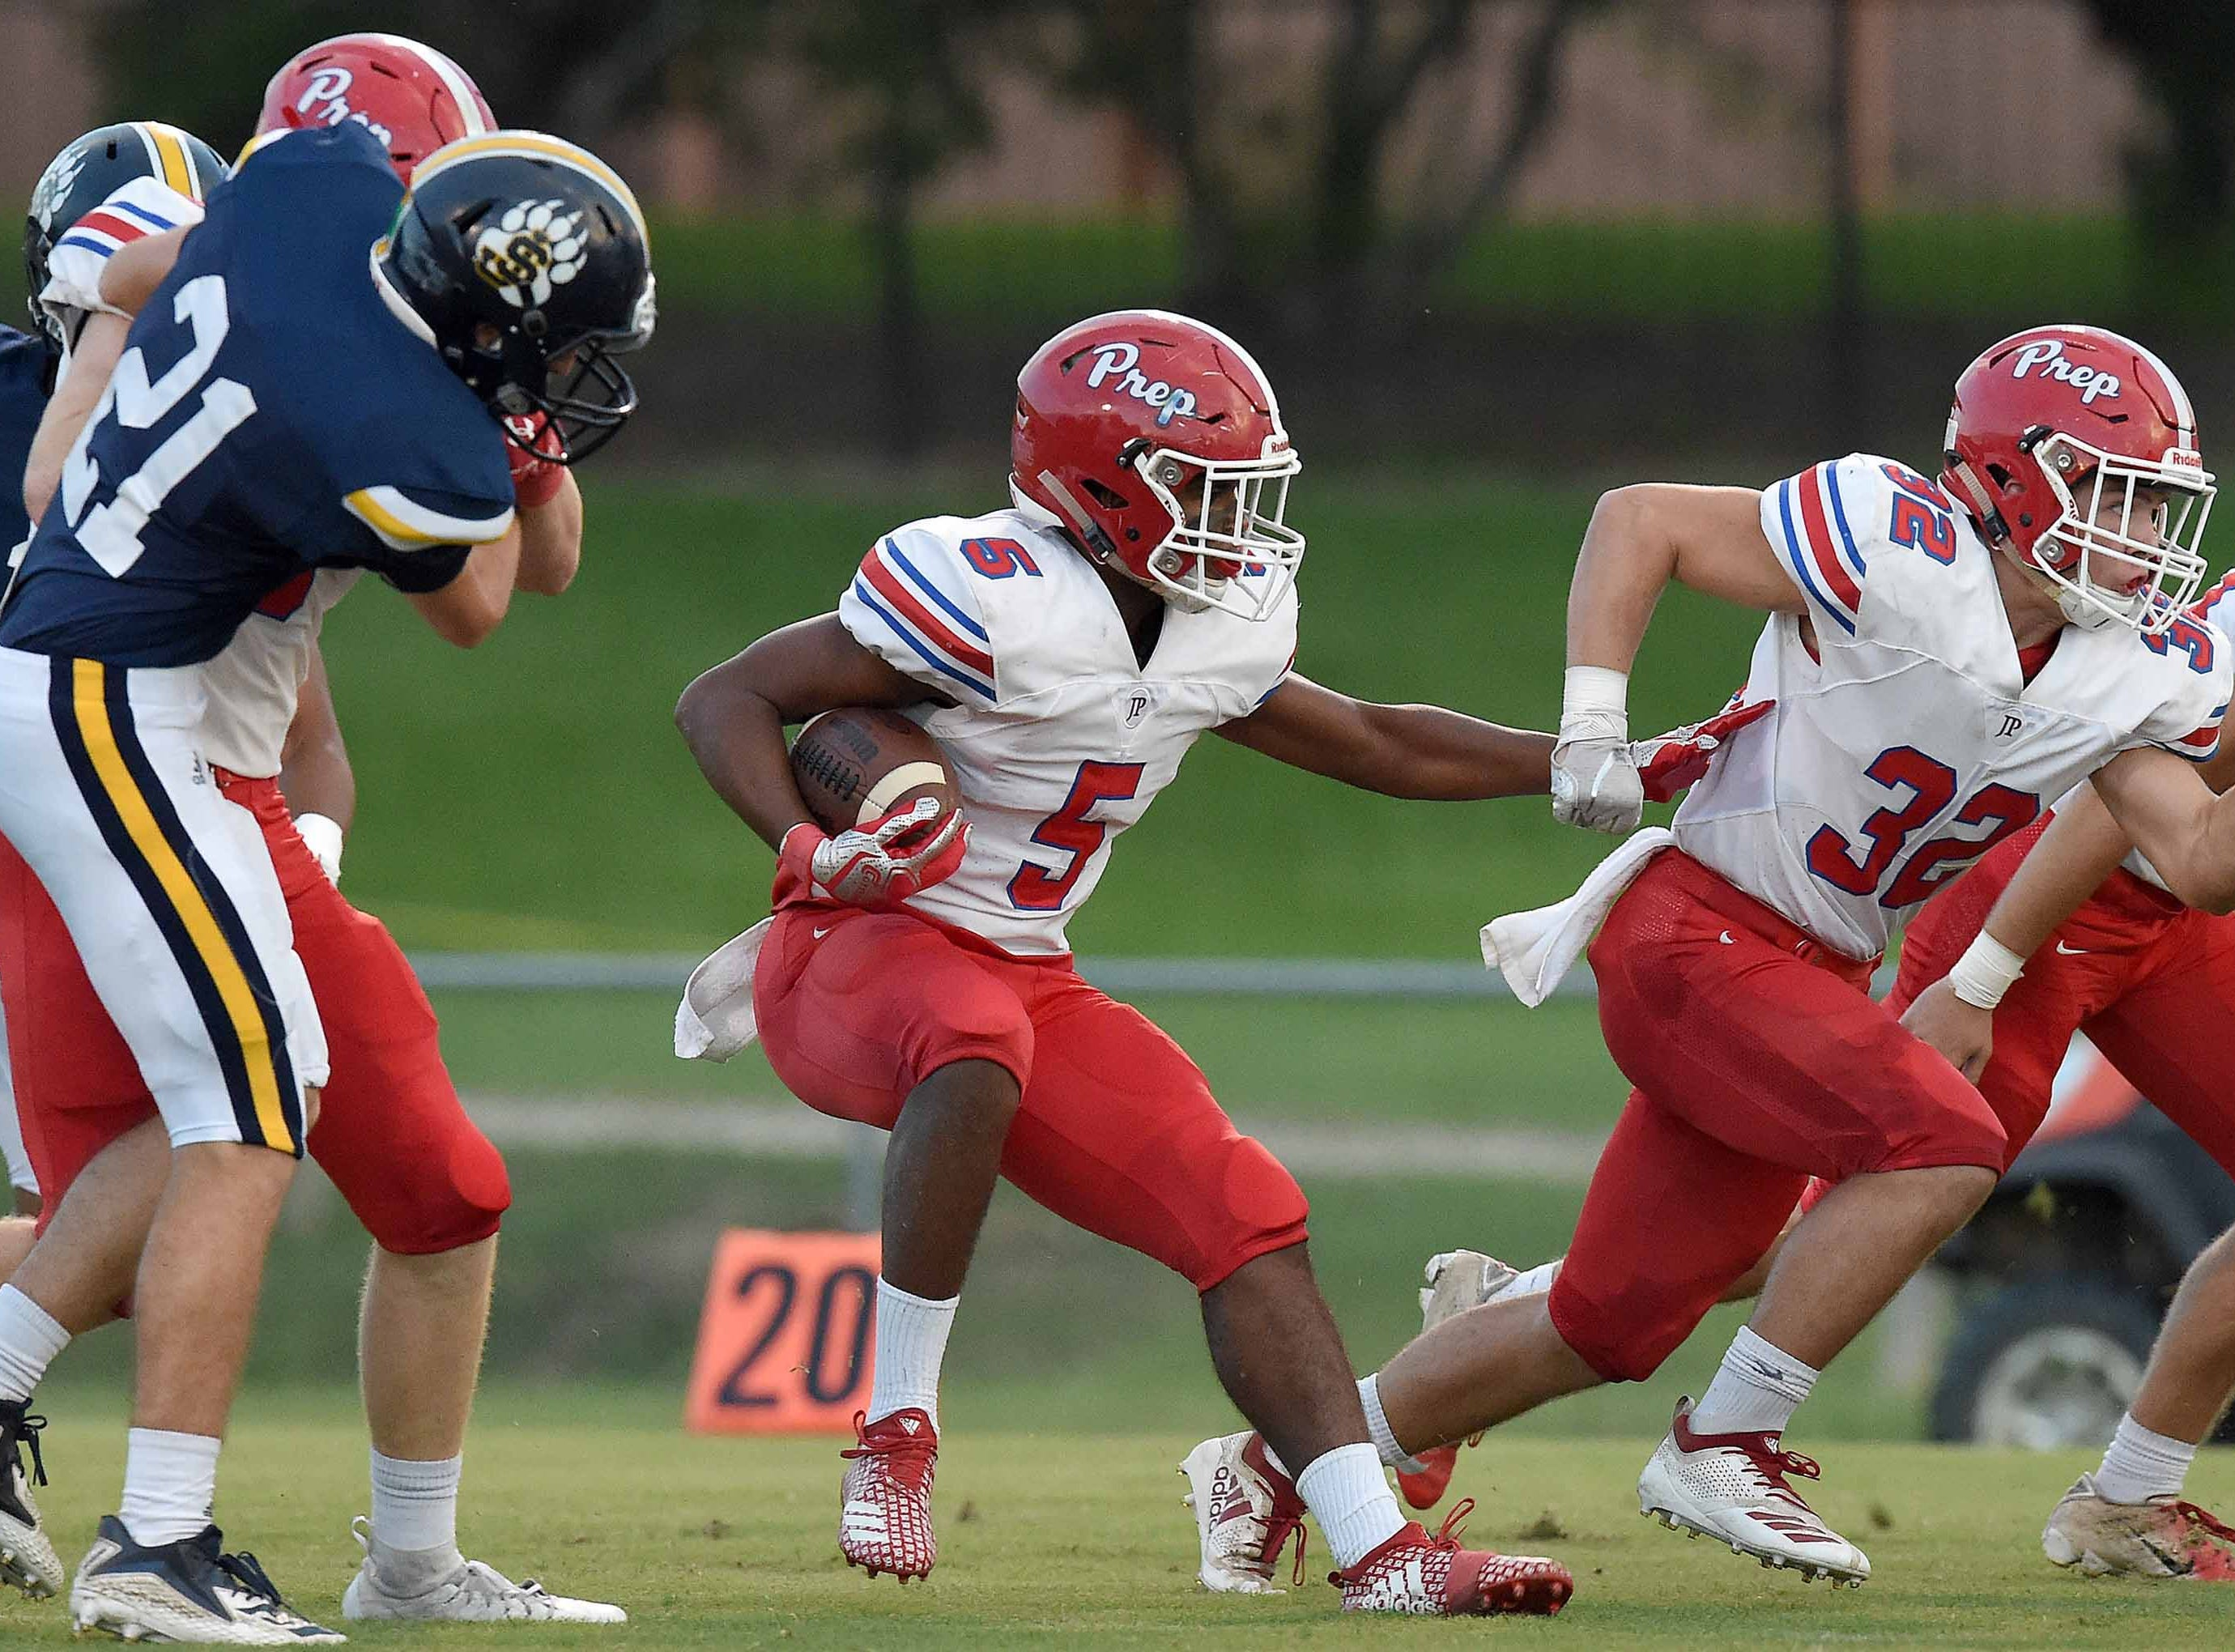 Prep's Matt Jones (5) follows Seth Cook (32) into the St. Joseph defensive line on Friday, September 14, 2018, at St. Joseph Catholic School in Madison, Miss.